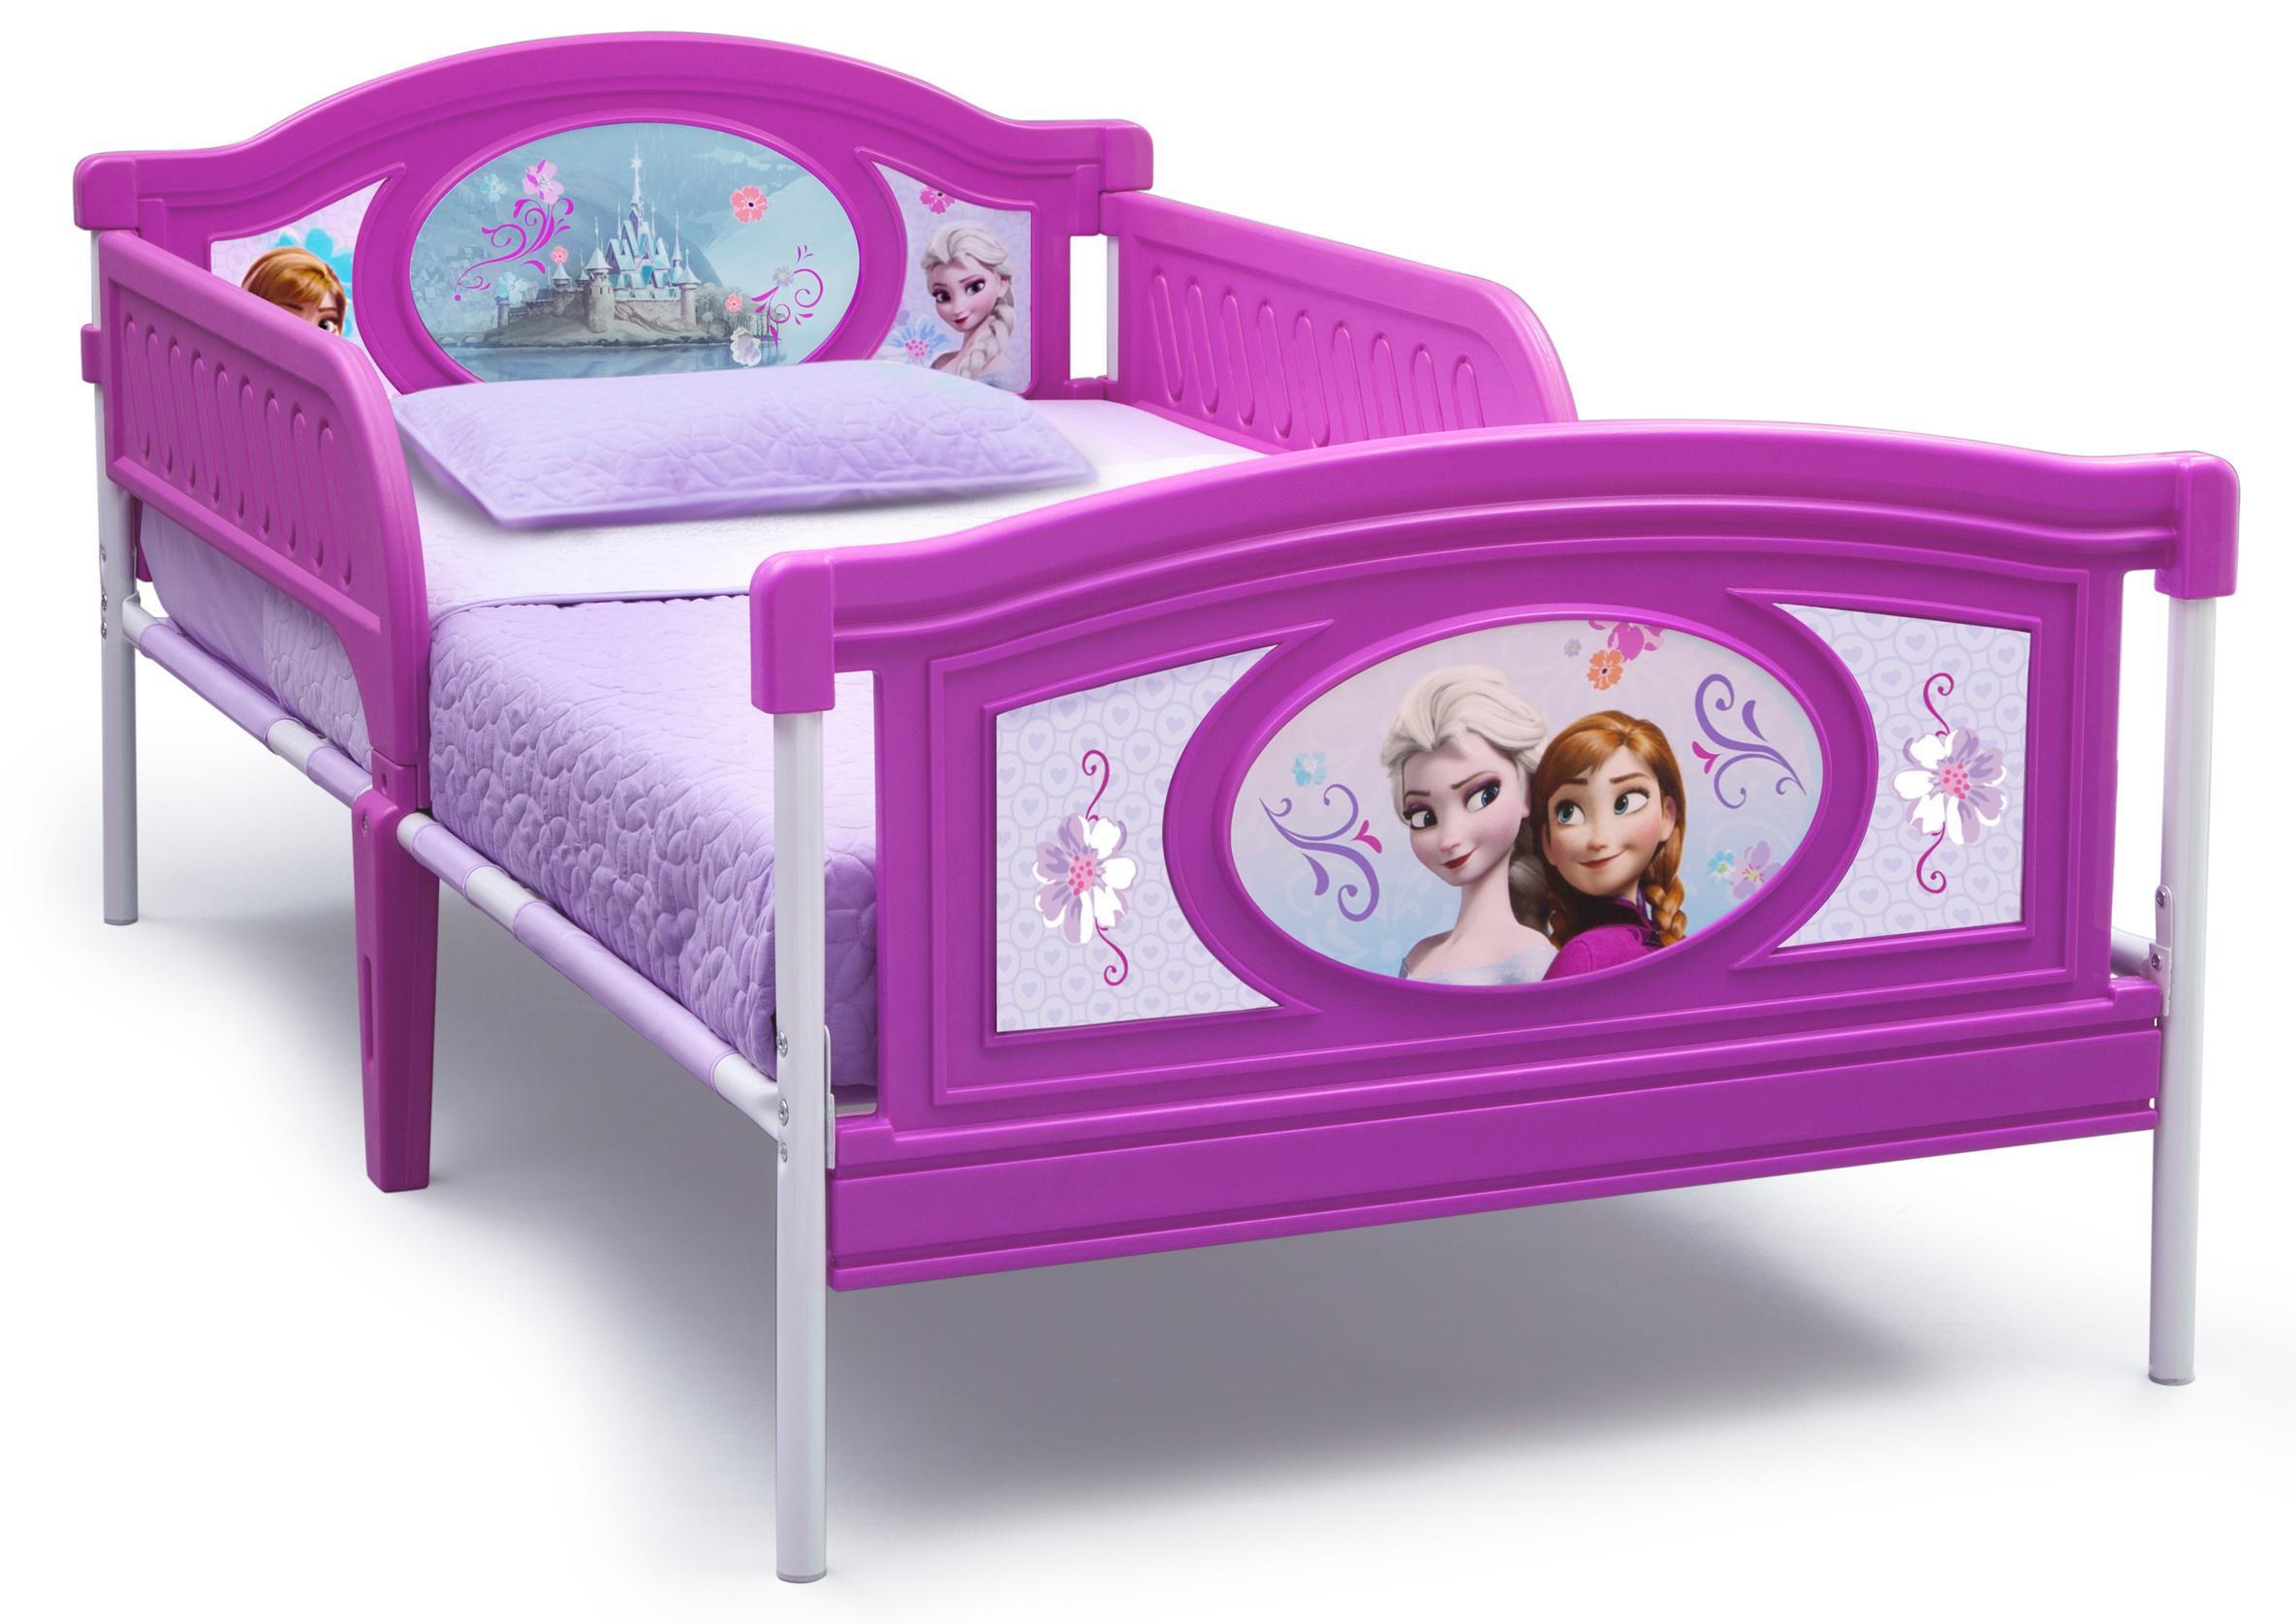 disney princess bedroom furniture disney princess bedroom car interior design. Black Bedroom Furniture Sets. Home Design Ideas